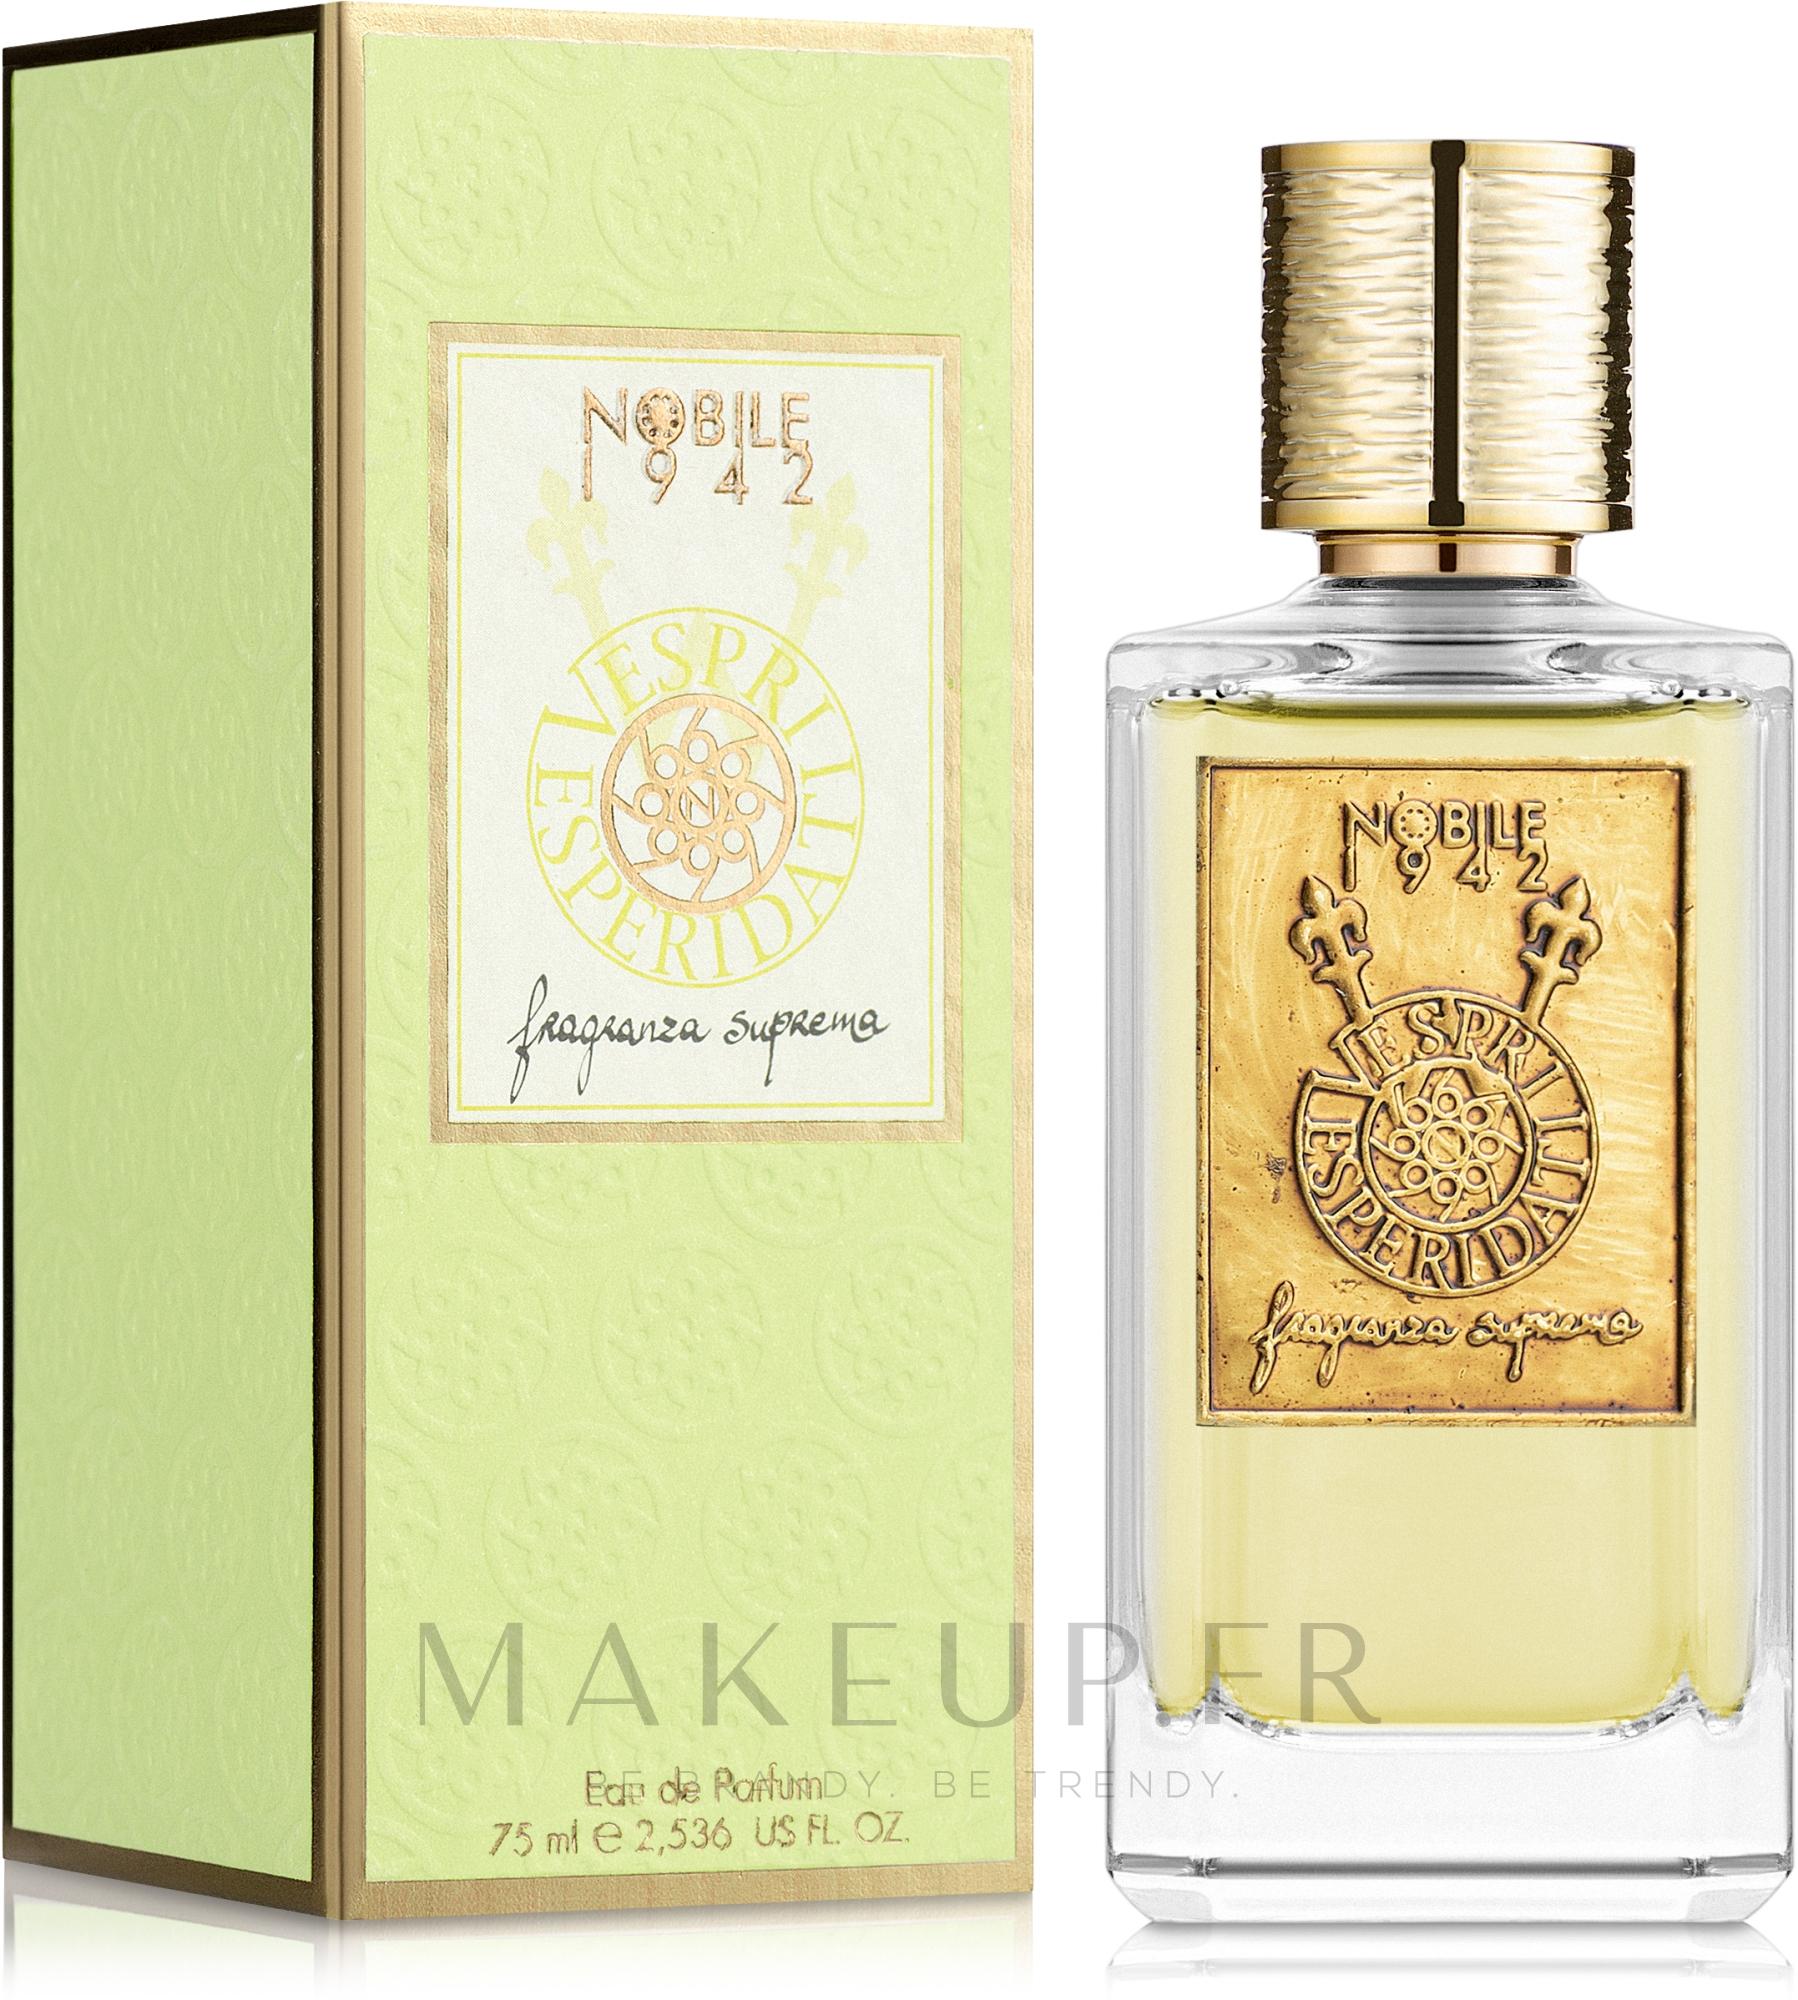 Nobile 1942 Vespriesperidati Gold - Eau de Parfum — Photo 75 ml